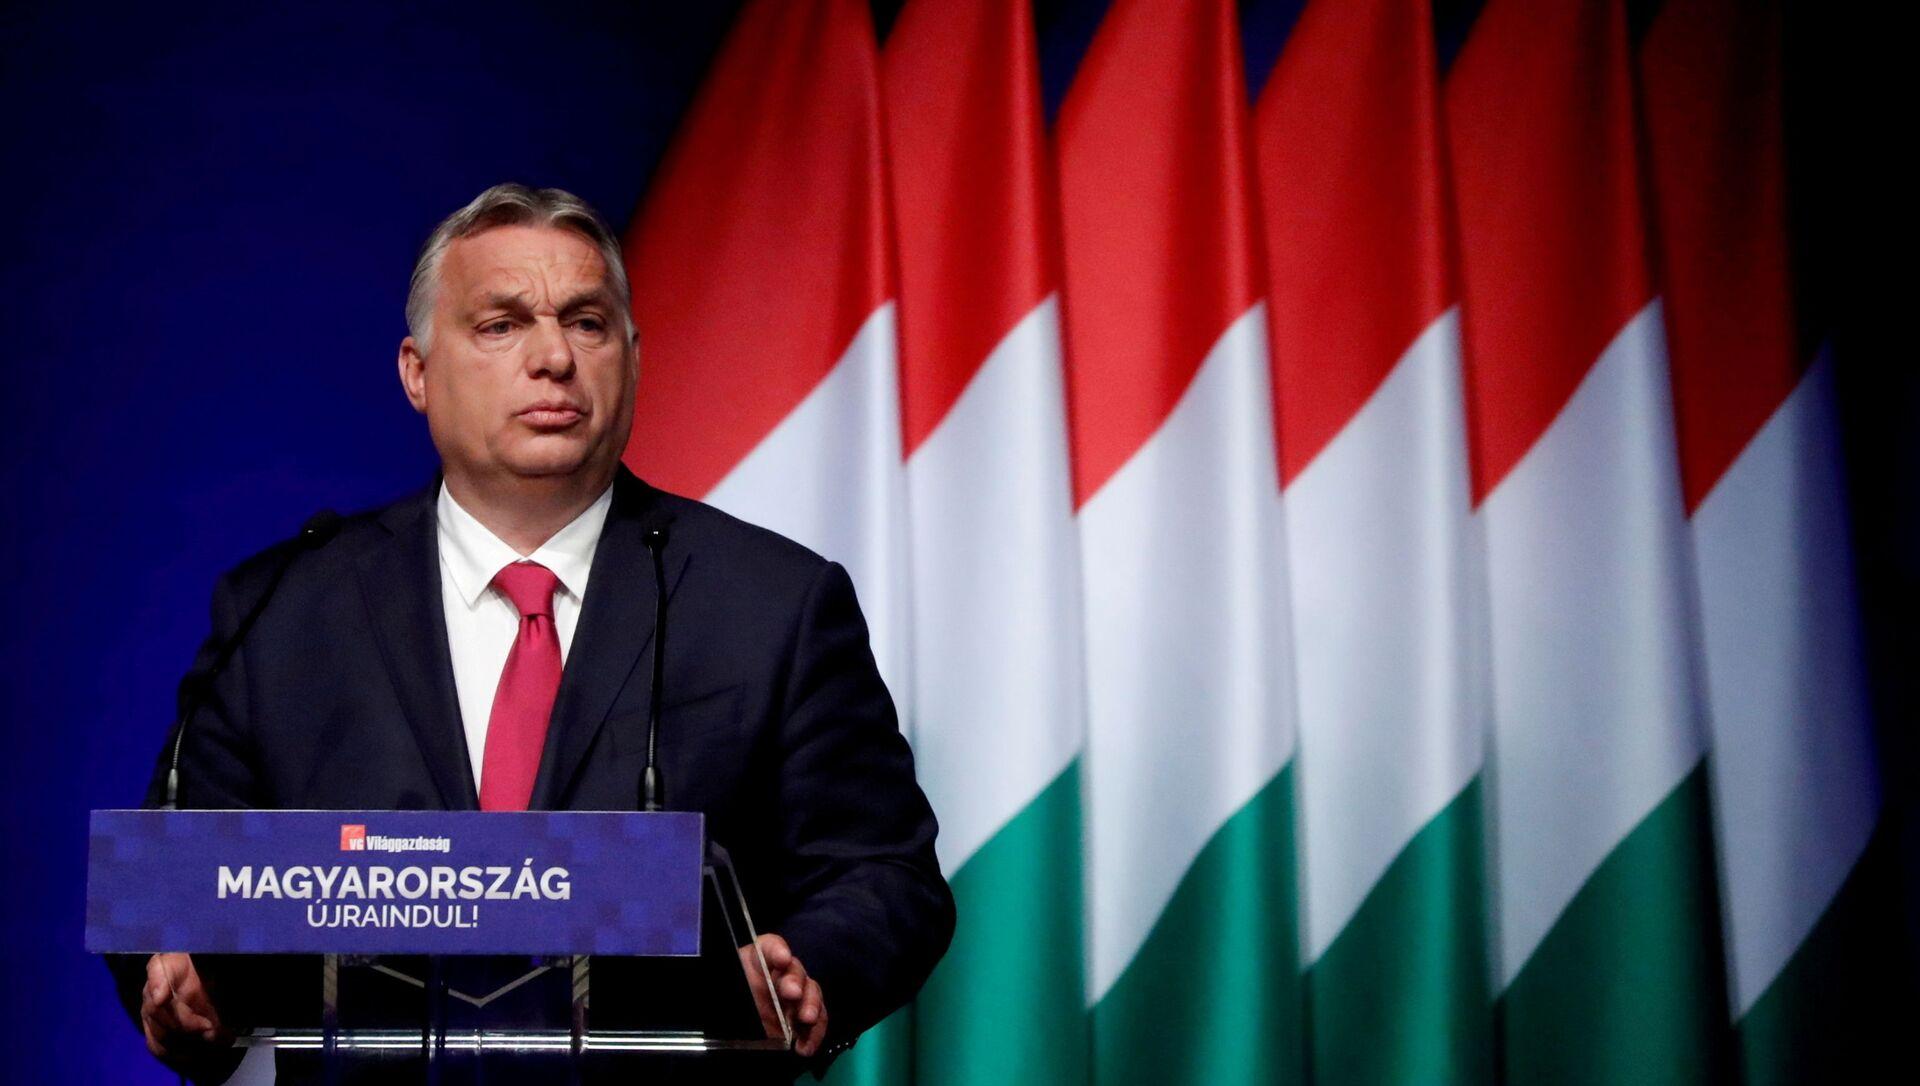 Viktor Orban à Budapest en juin 2021 - Sputnik France, 1920, 09.08.2021